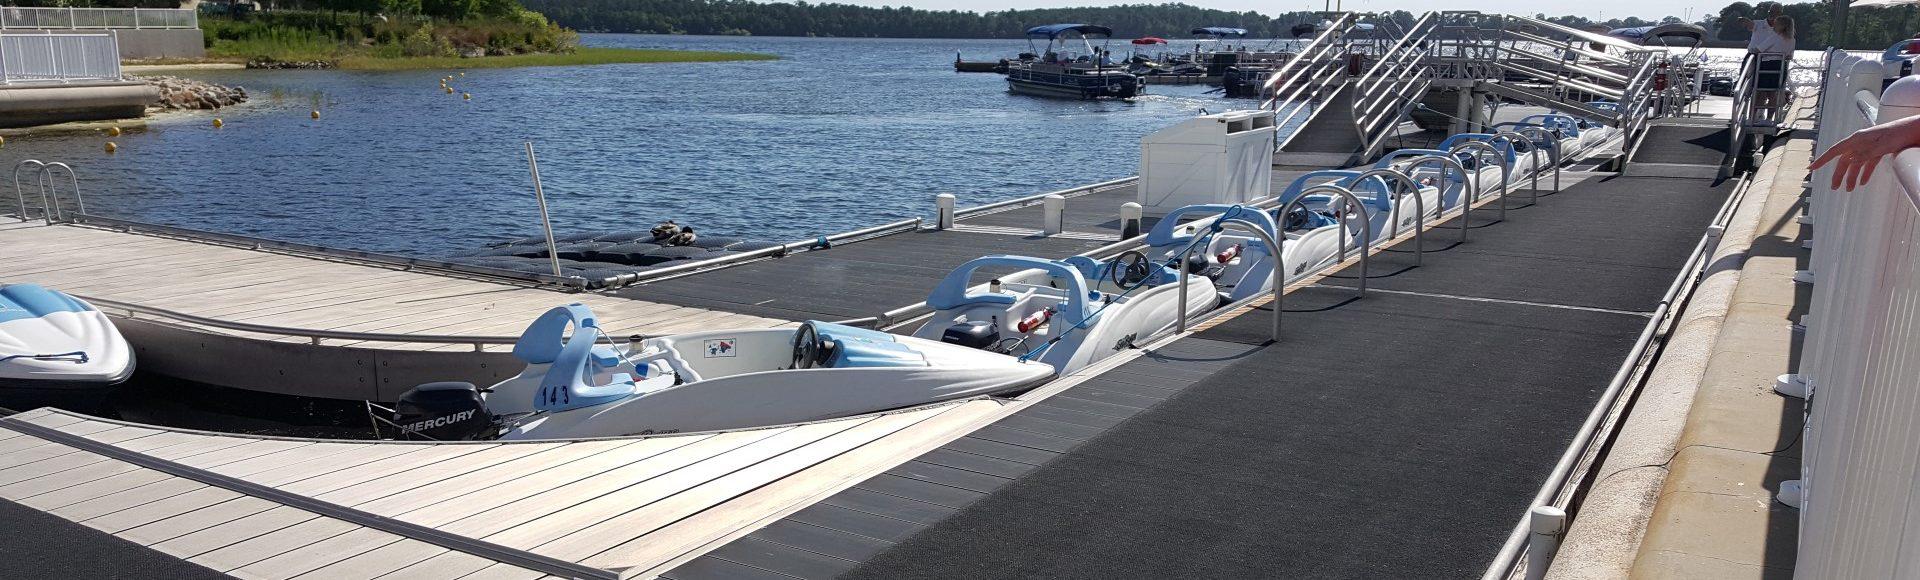 mini jet boats